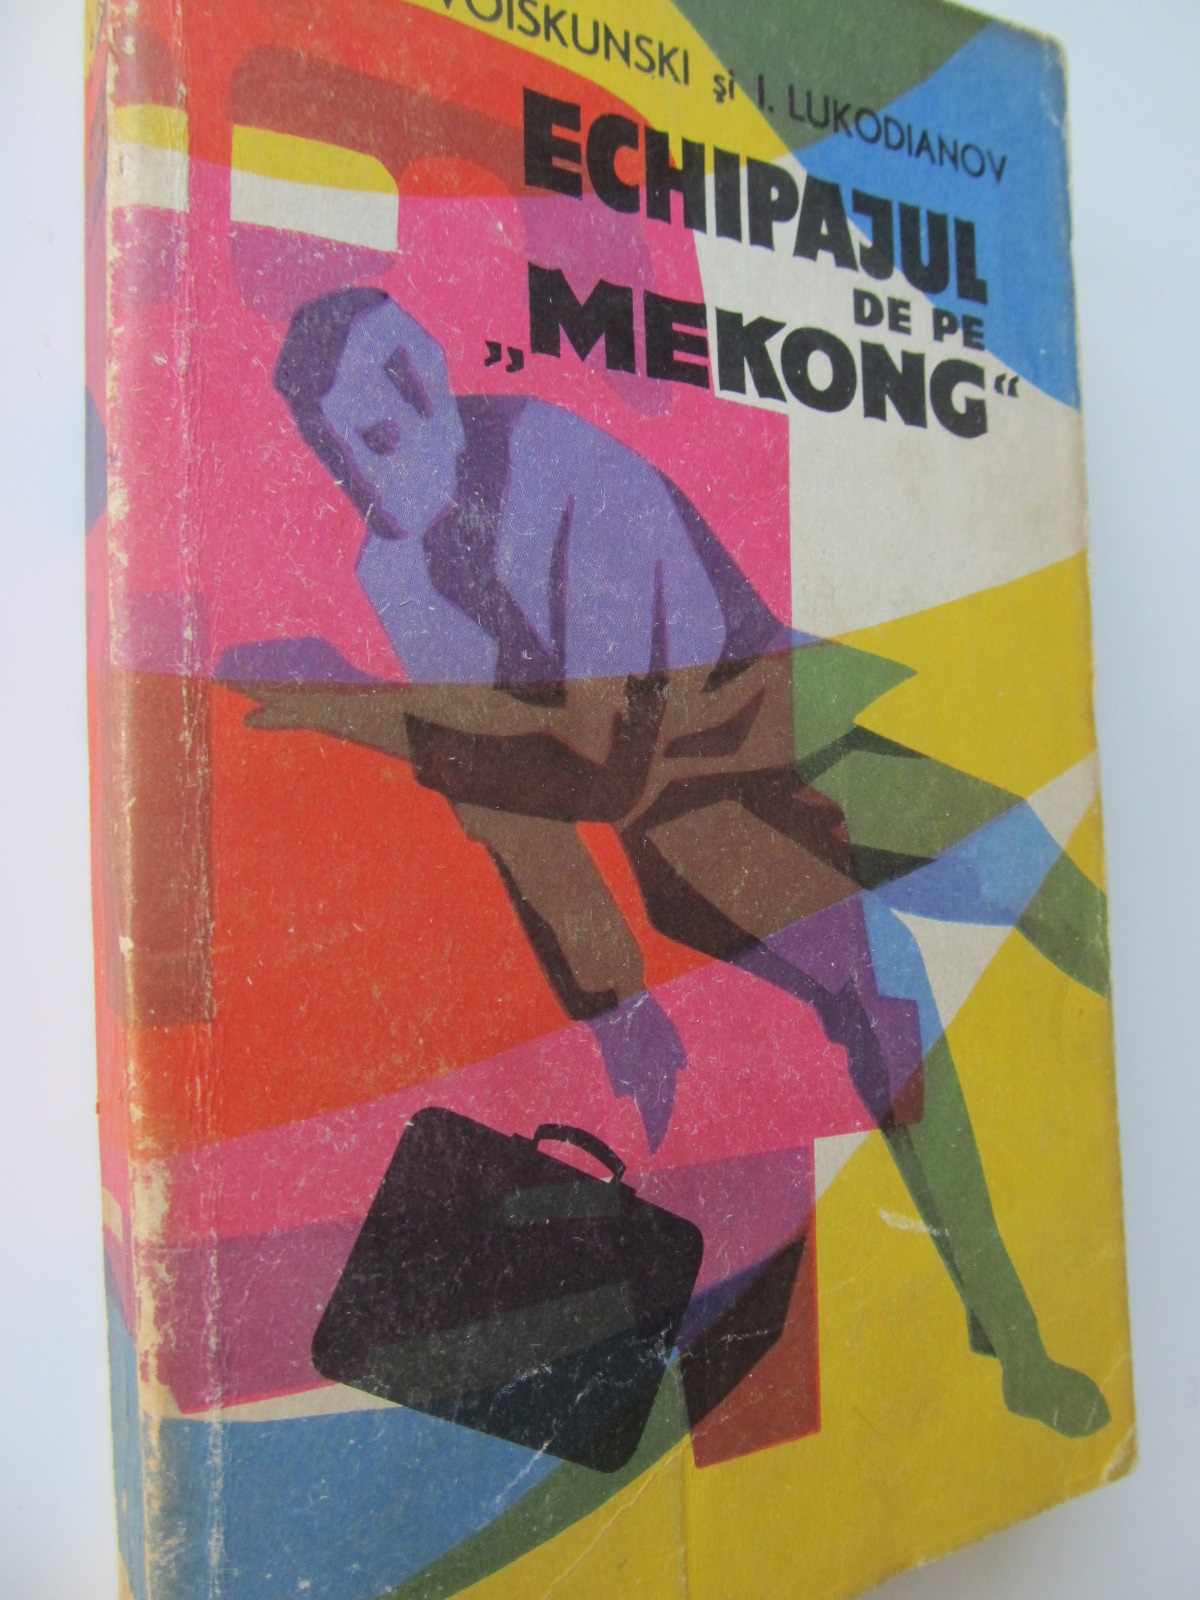 Echipajul de pe Mekong - E. Voiskunski , I. Lukodianov | Detalii carte